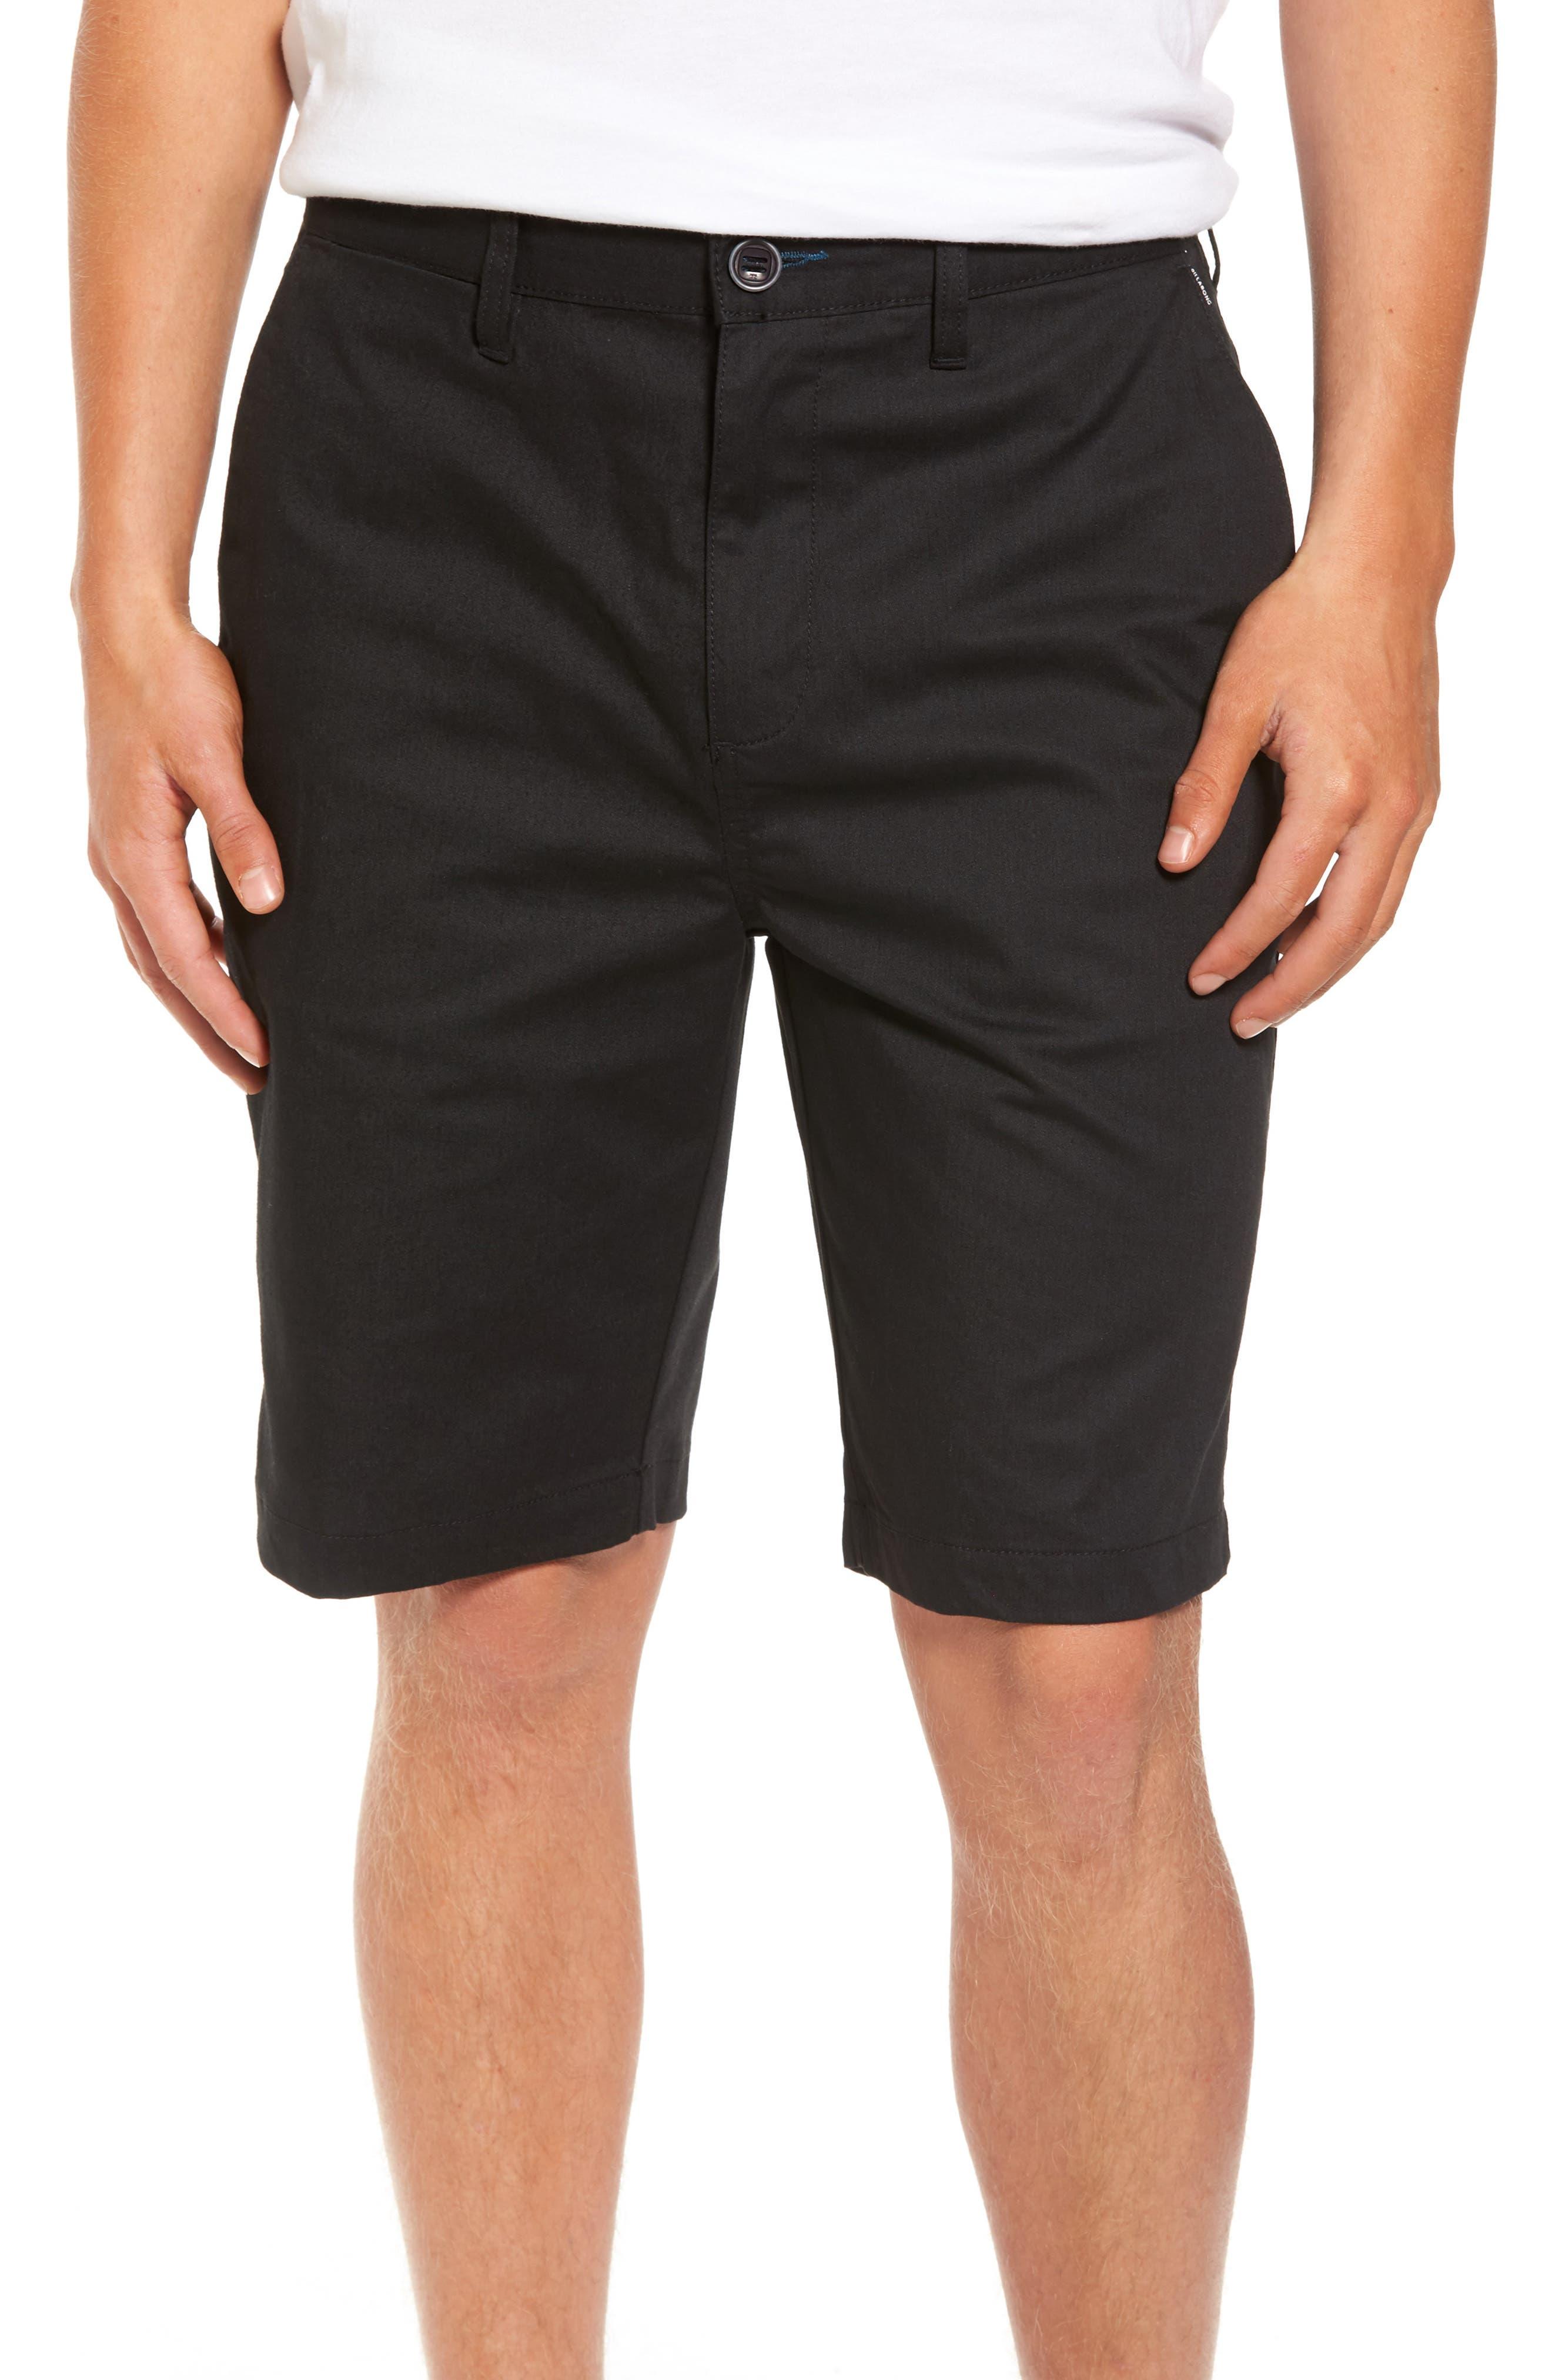 Alternate Image 1 Selected - Billabong Carter Stretch Twill Shorts